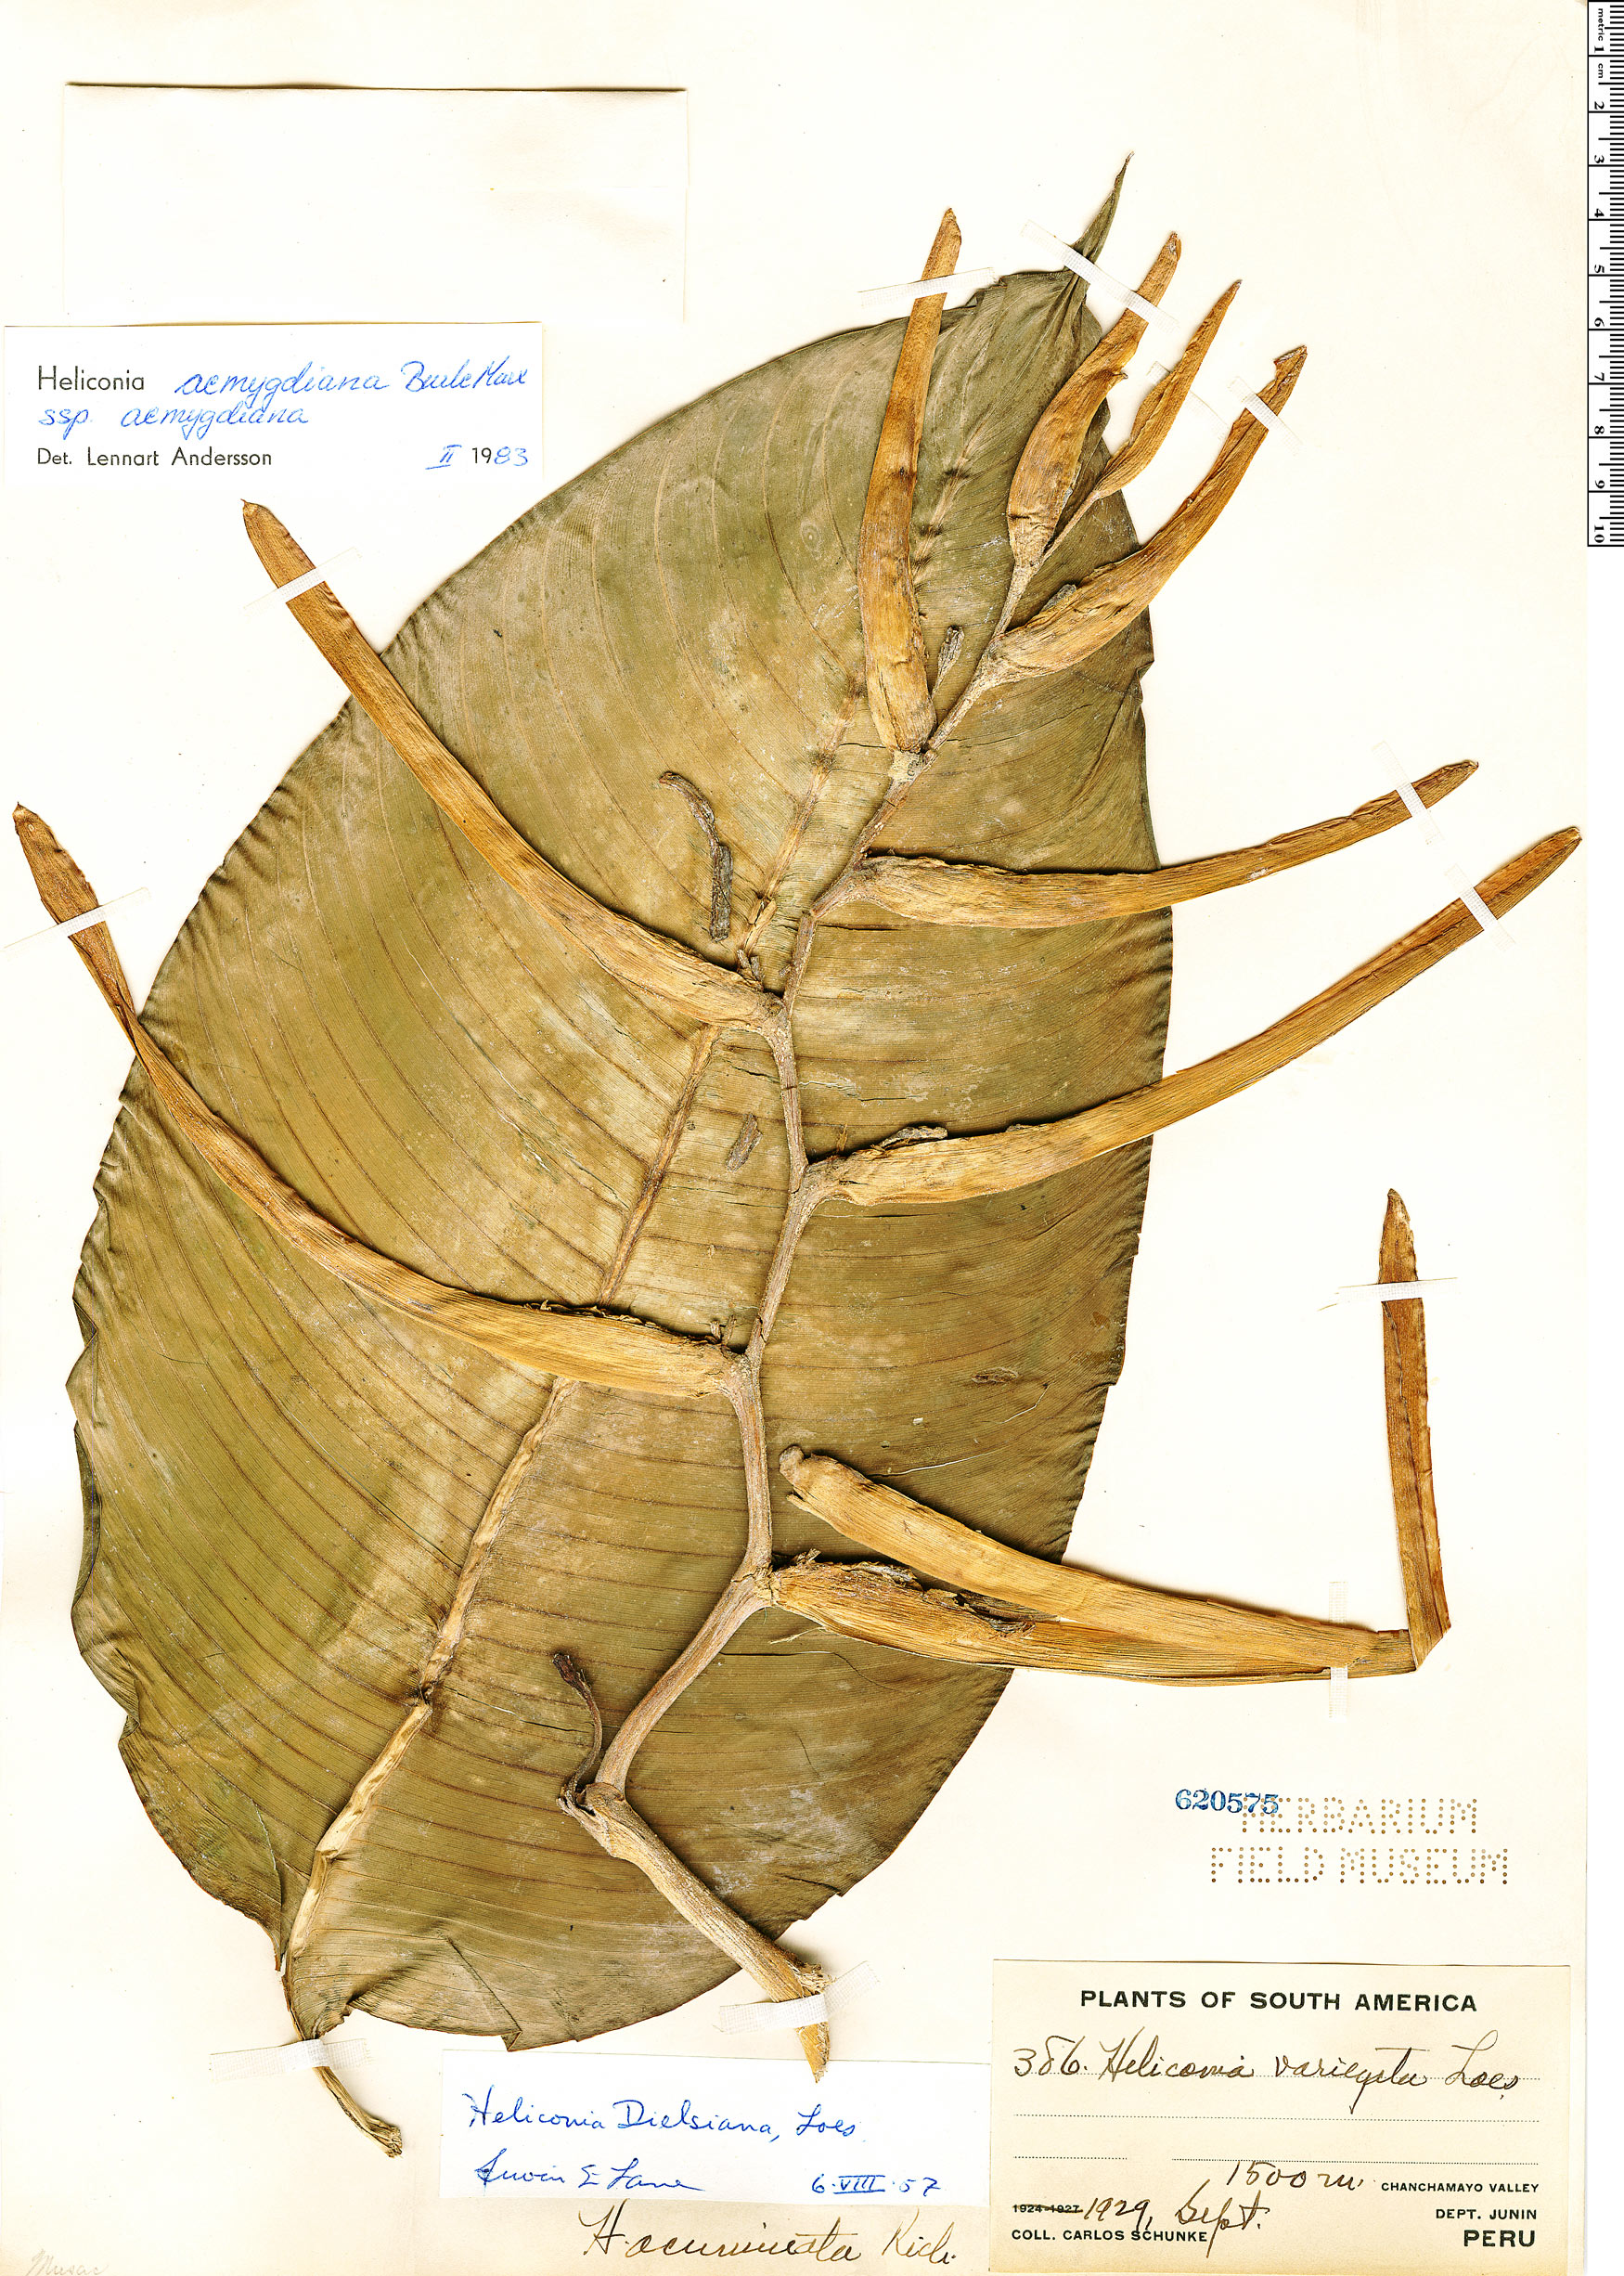 Specimen: Heliconia aemygdiana